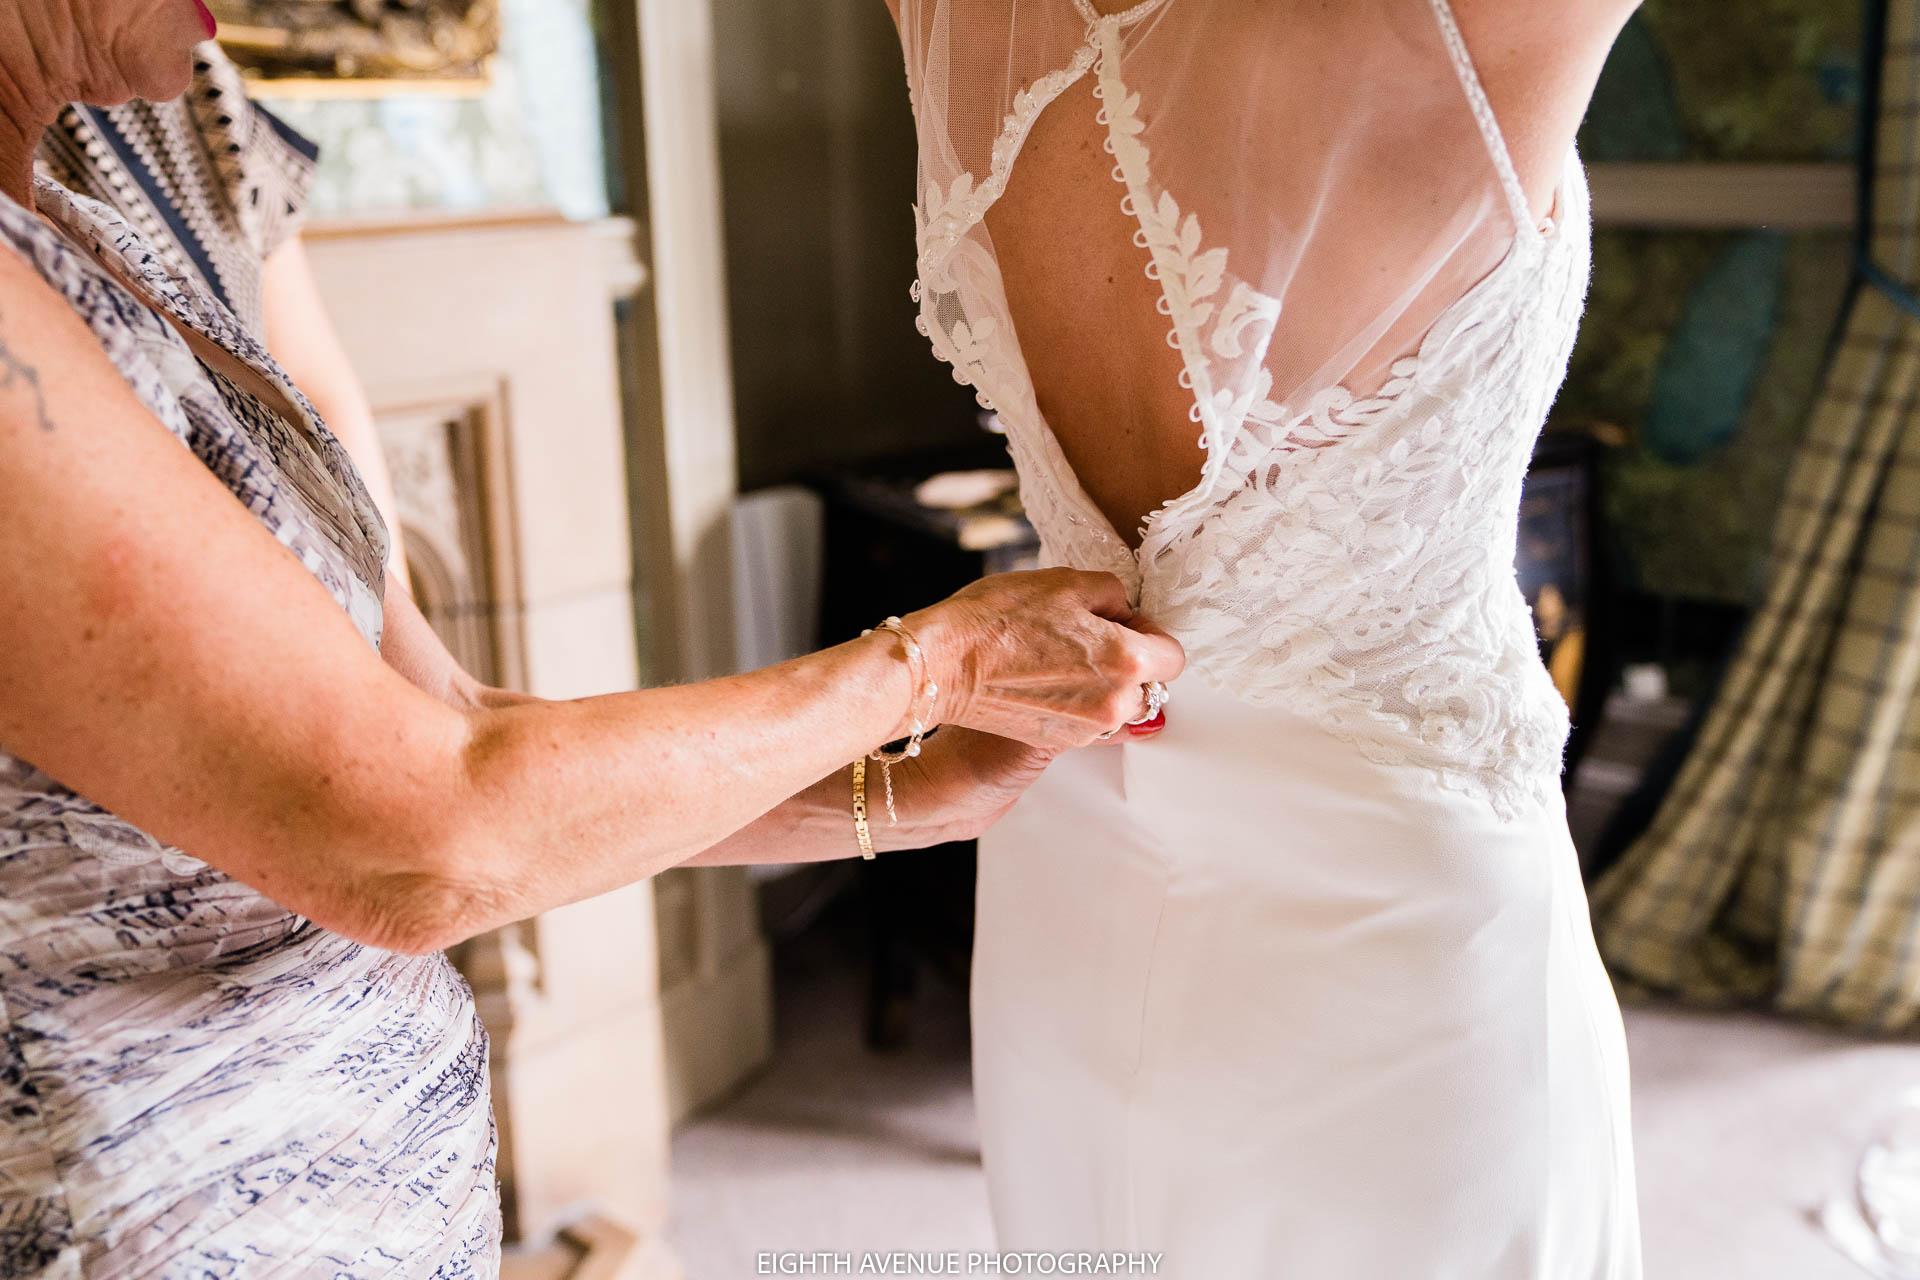 Doing brides dress up